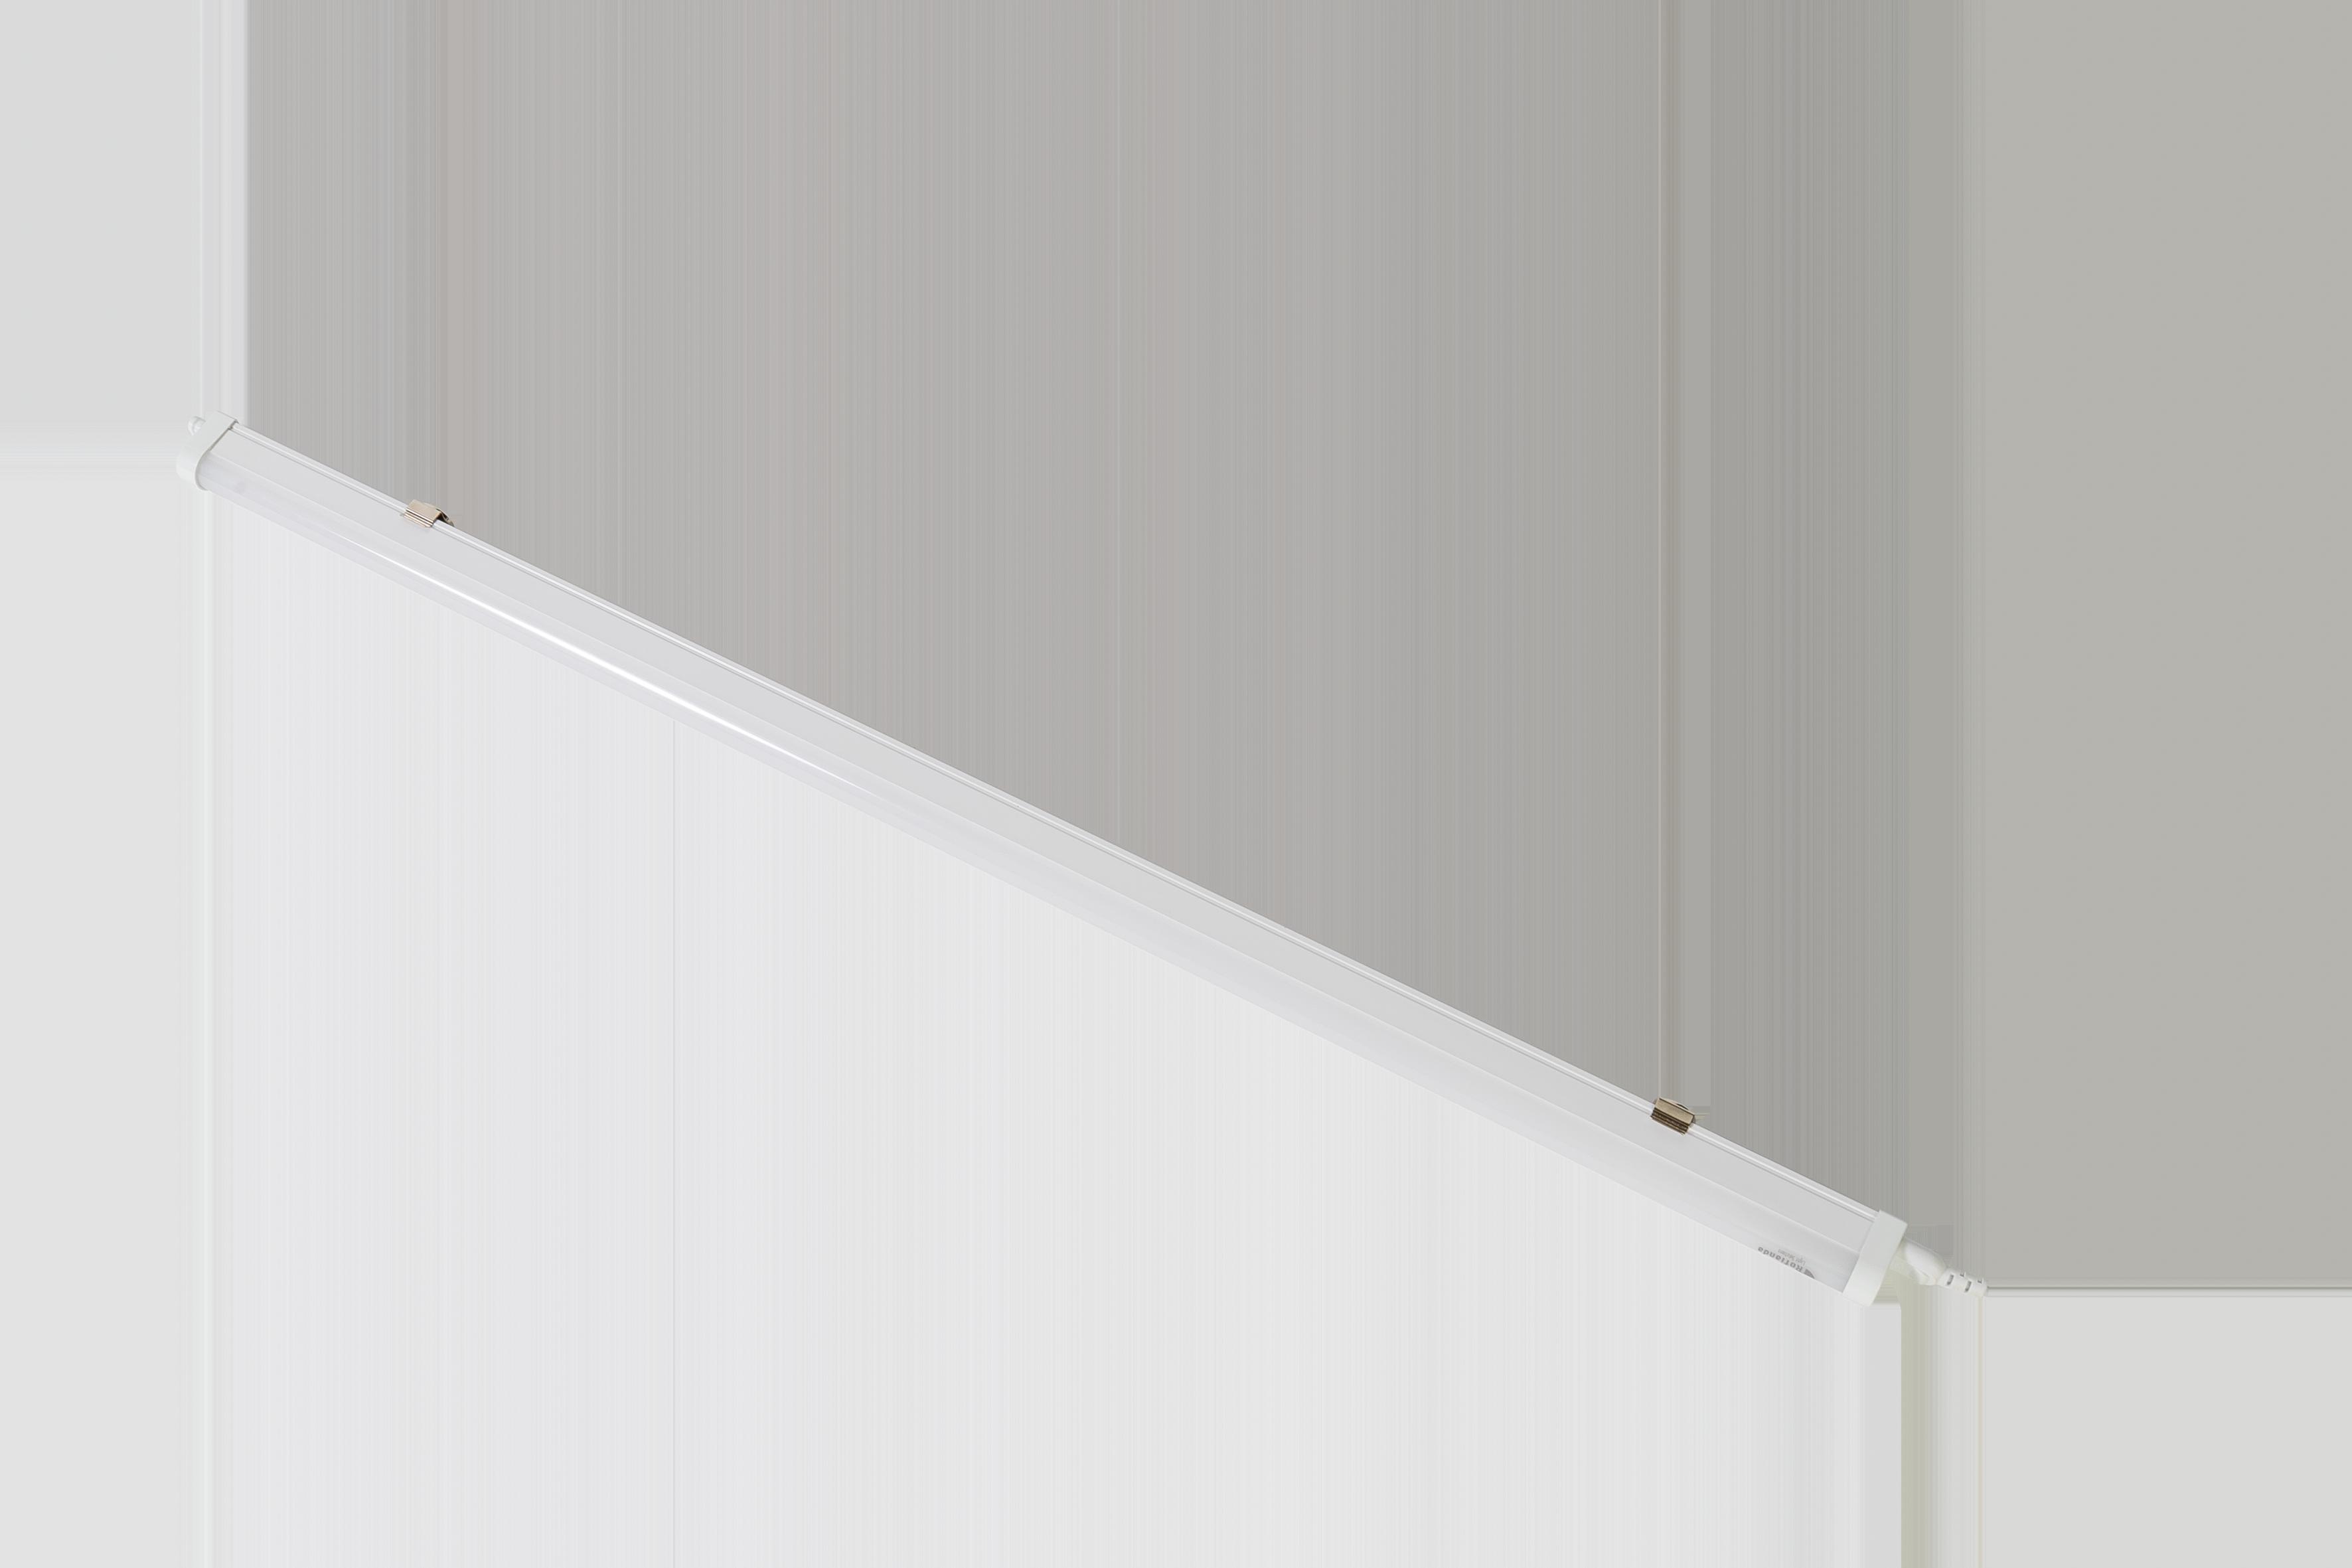 Kweekverlichting met LED